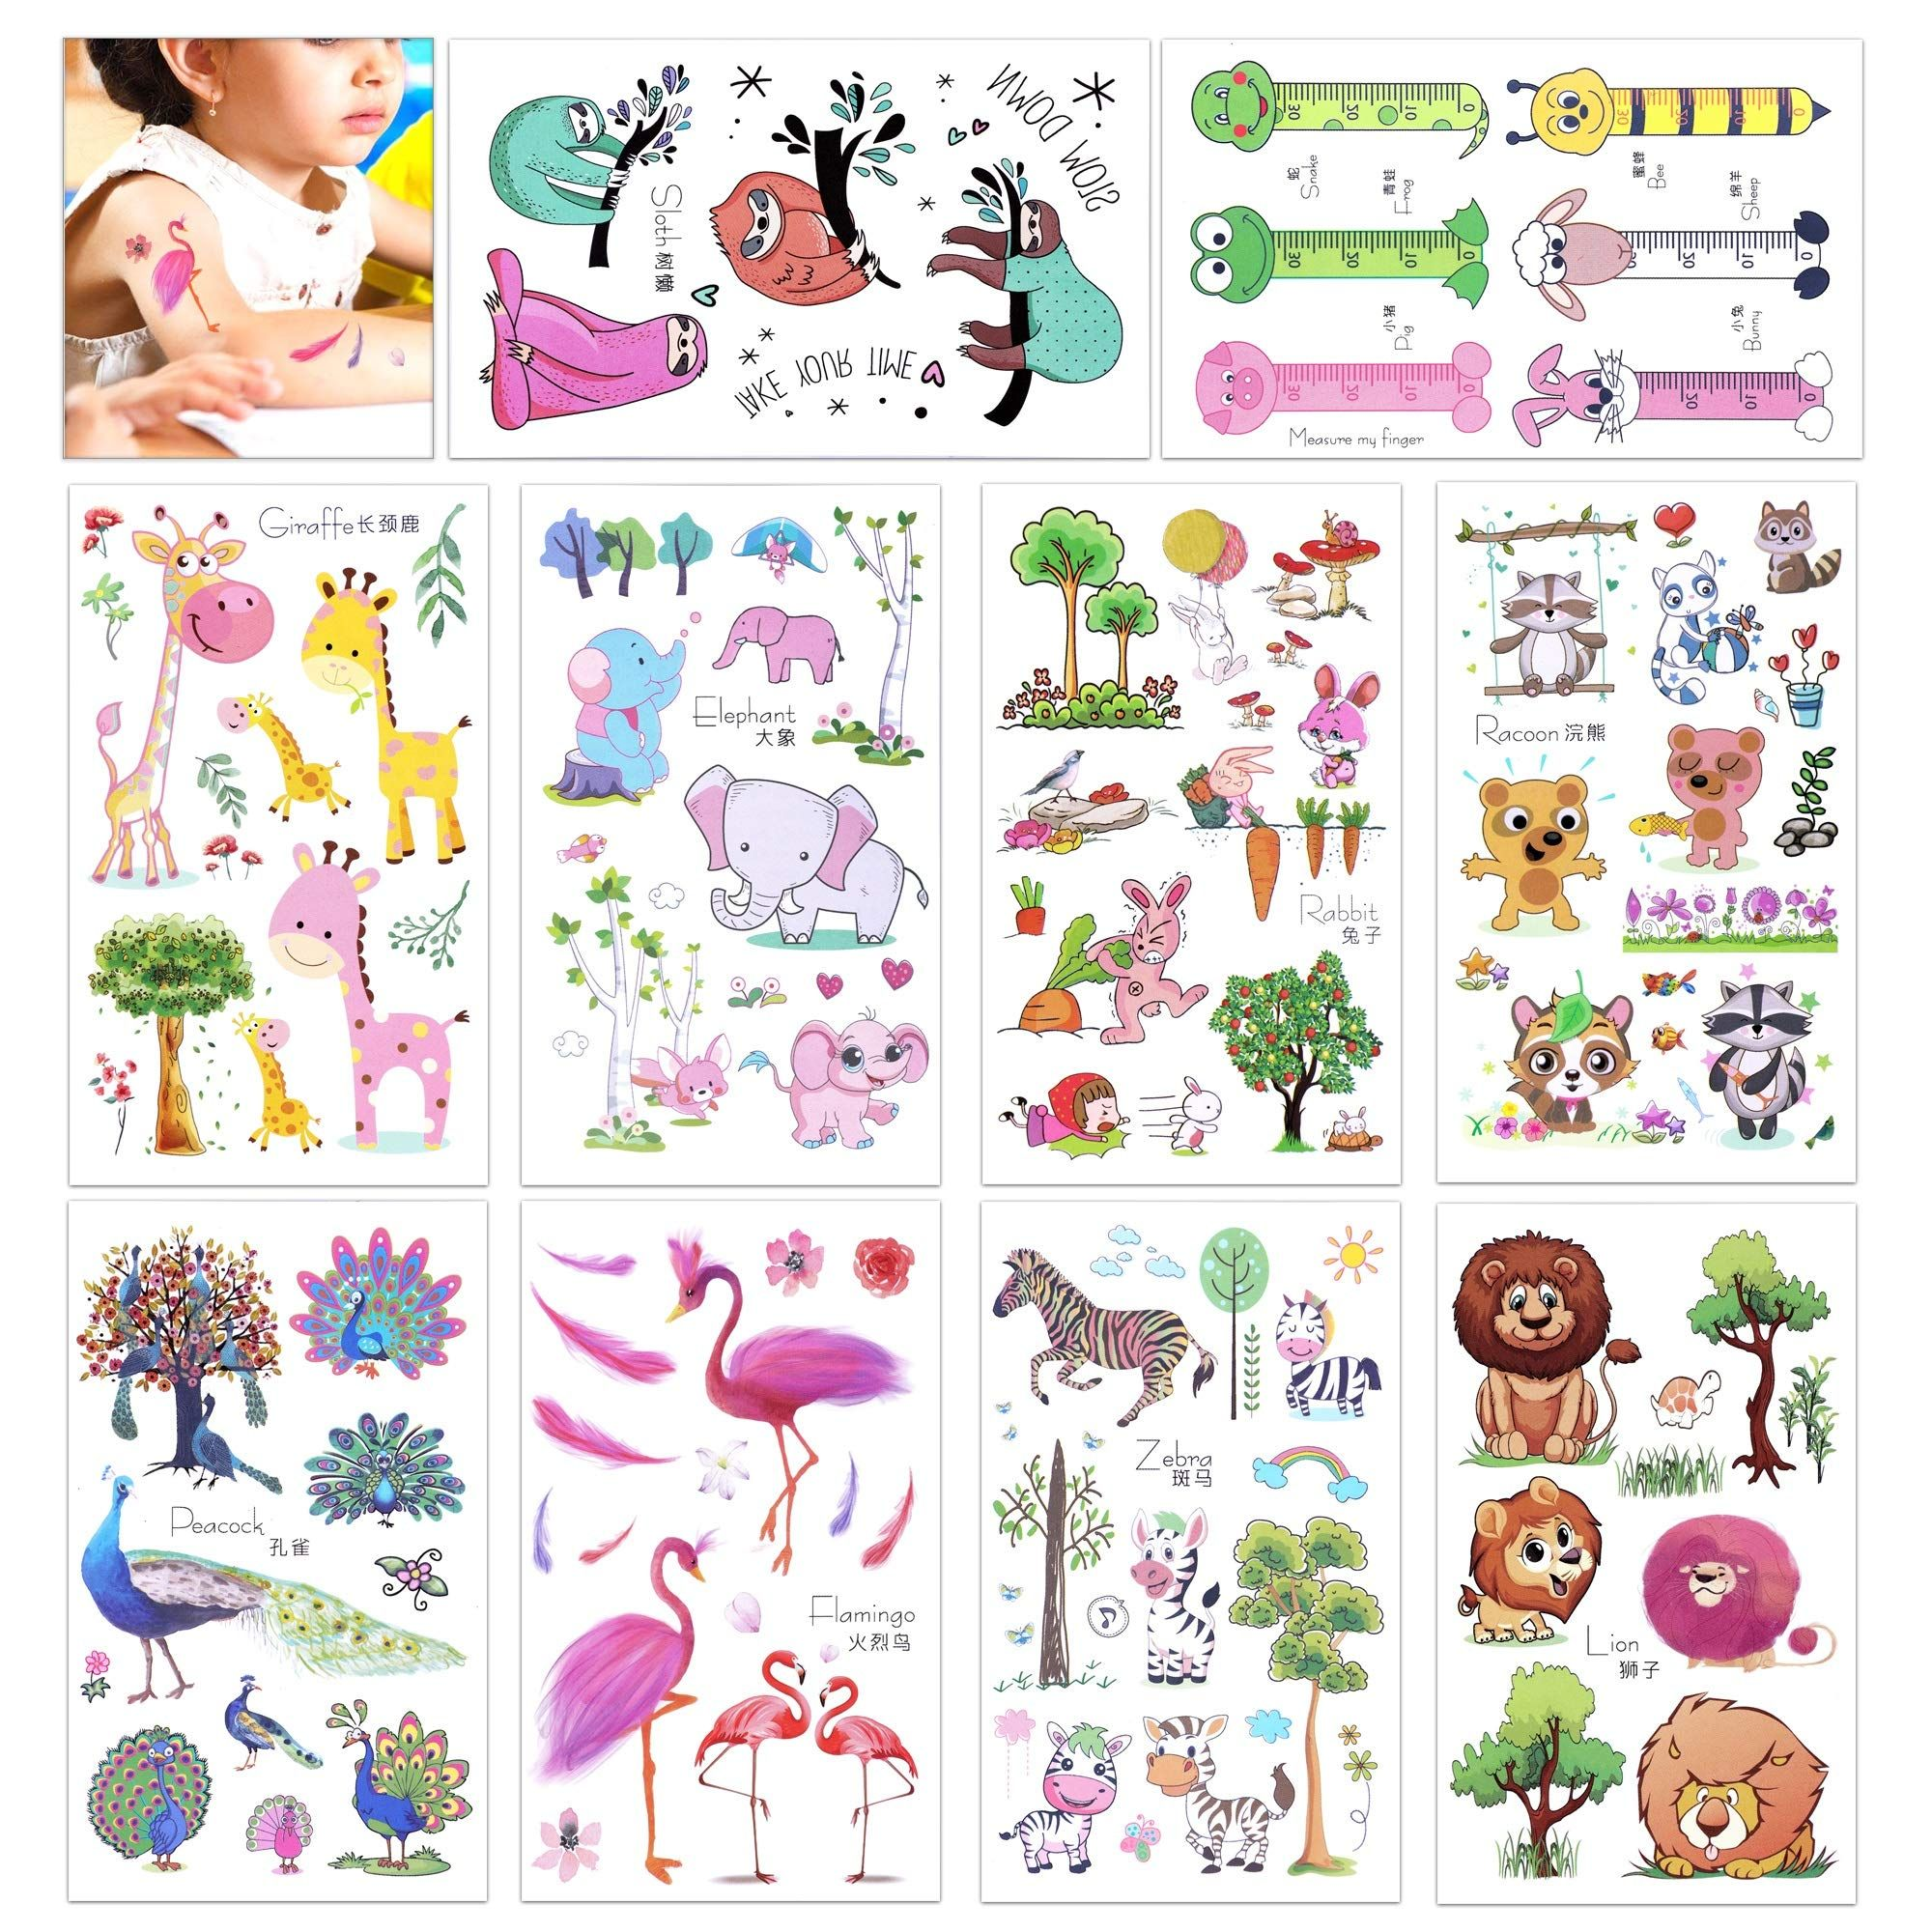 Konsait 150 assorted zoo animal temporary tattoos for